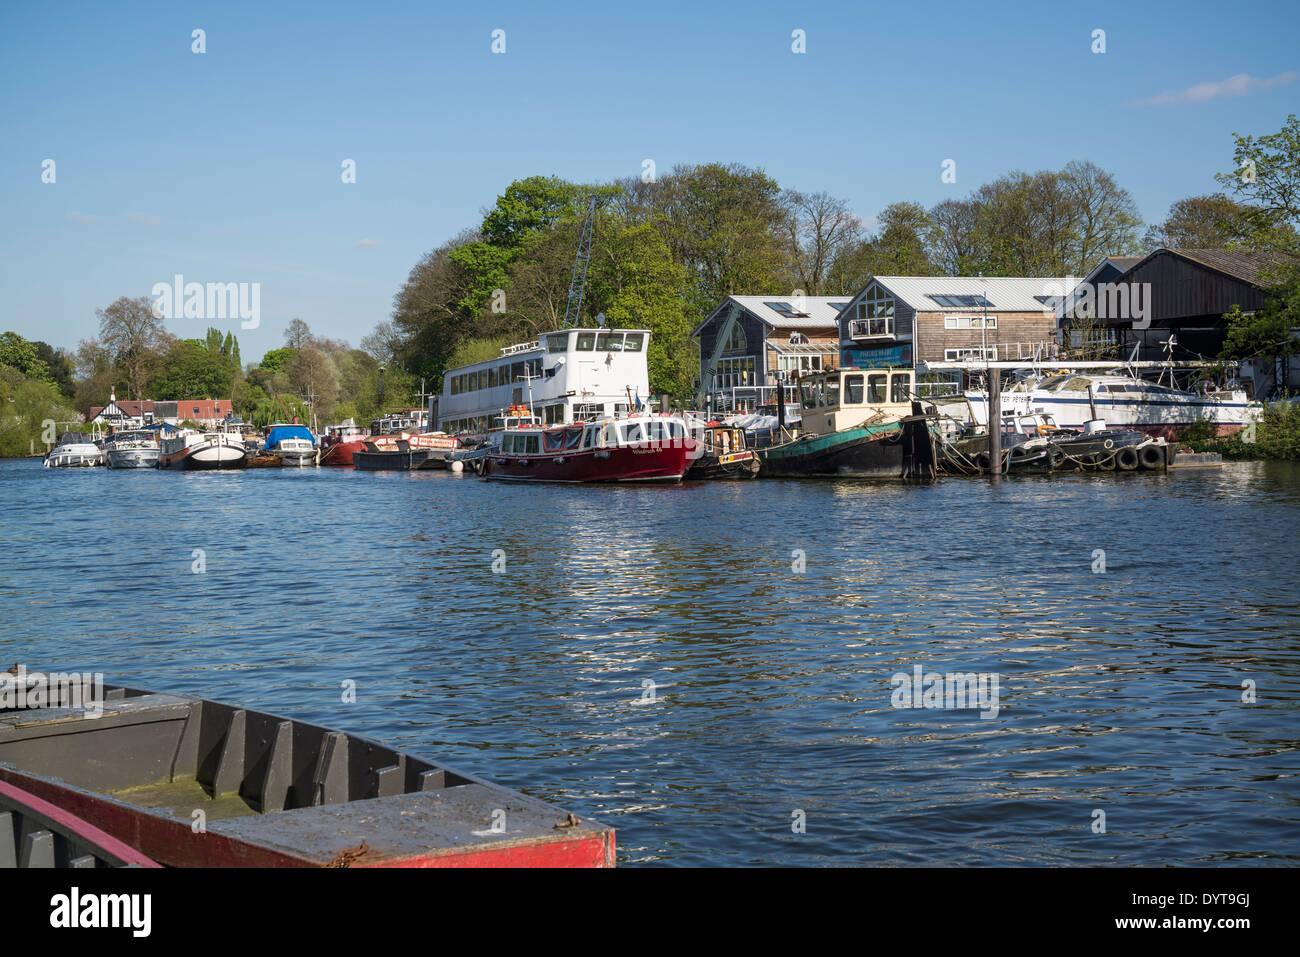 Boatyard on the river Thames at Twickenham, London, UK - Stock Image